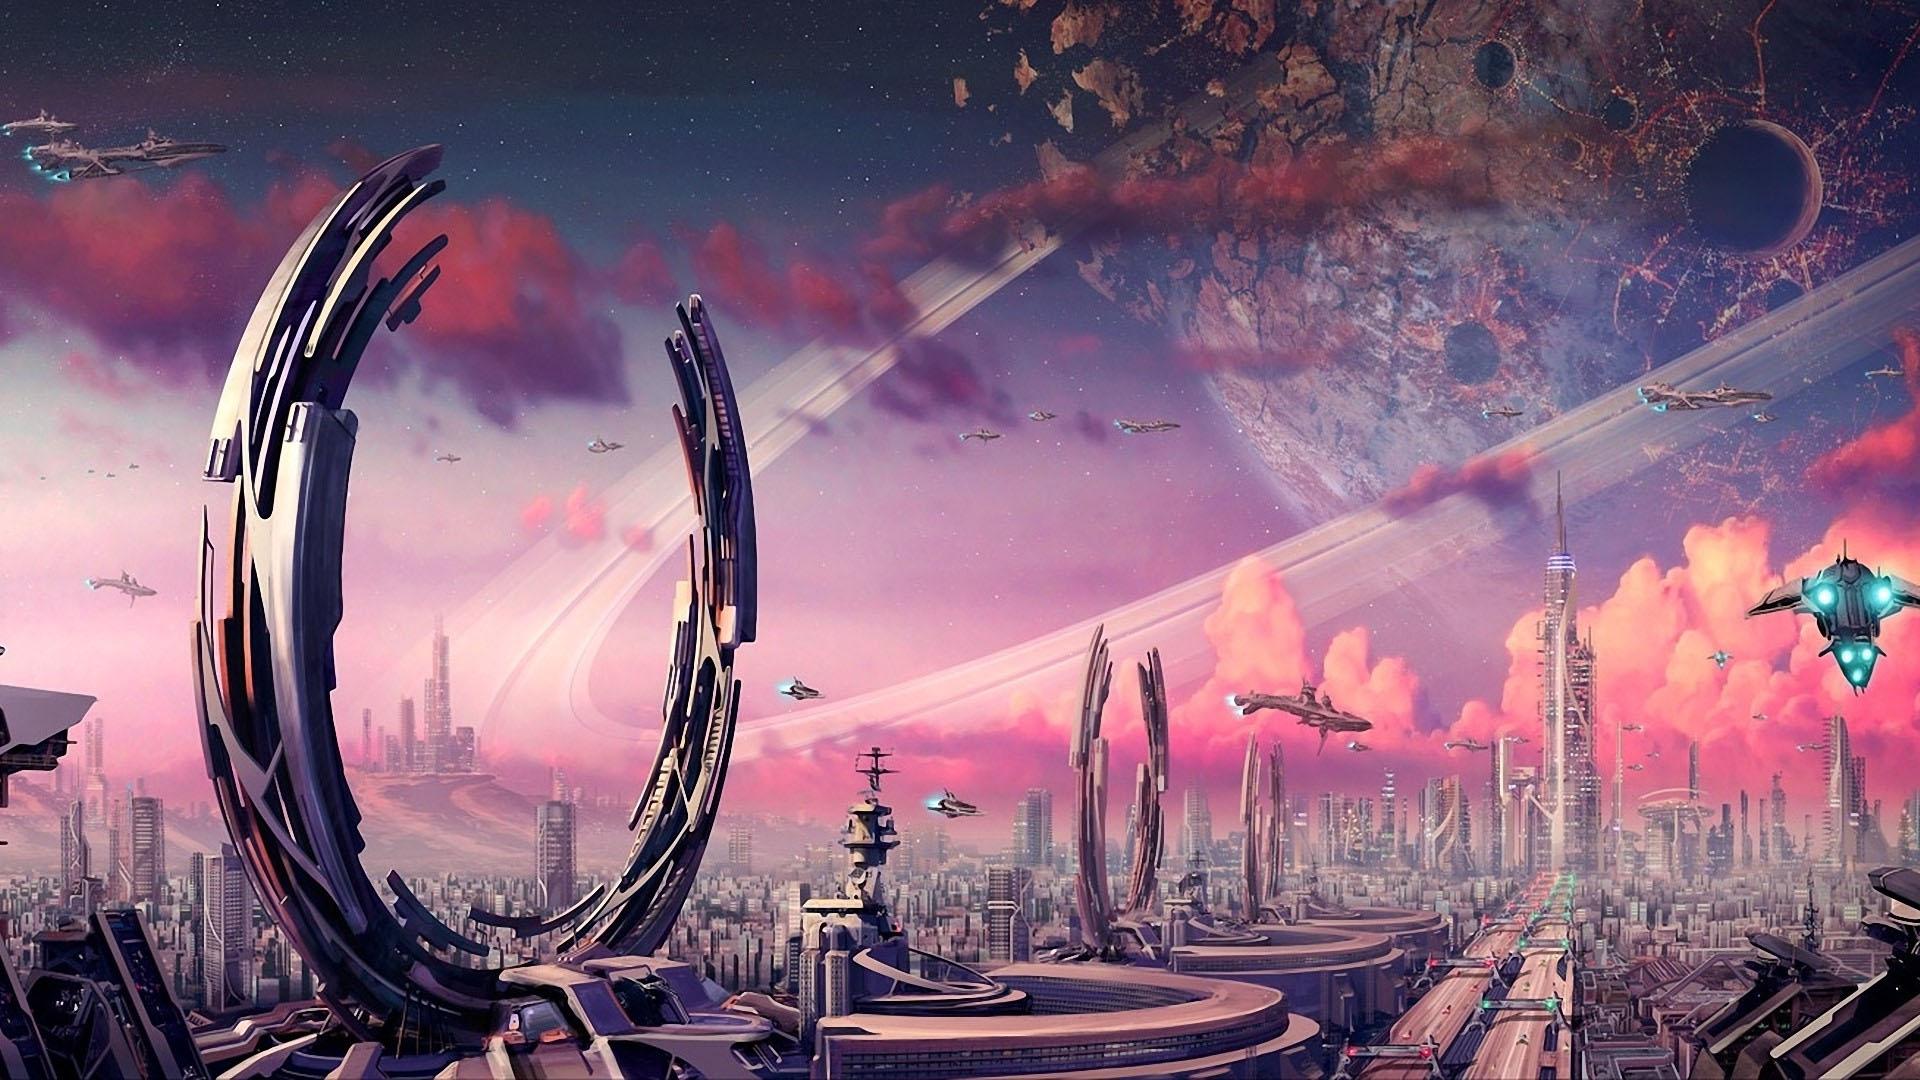 distant alien city